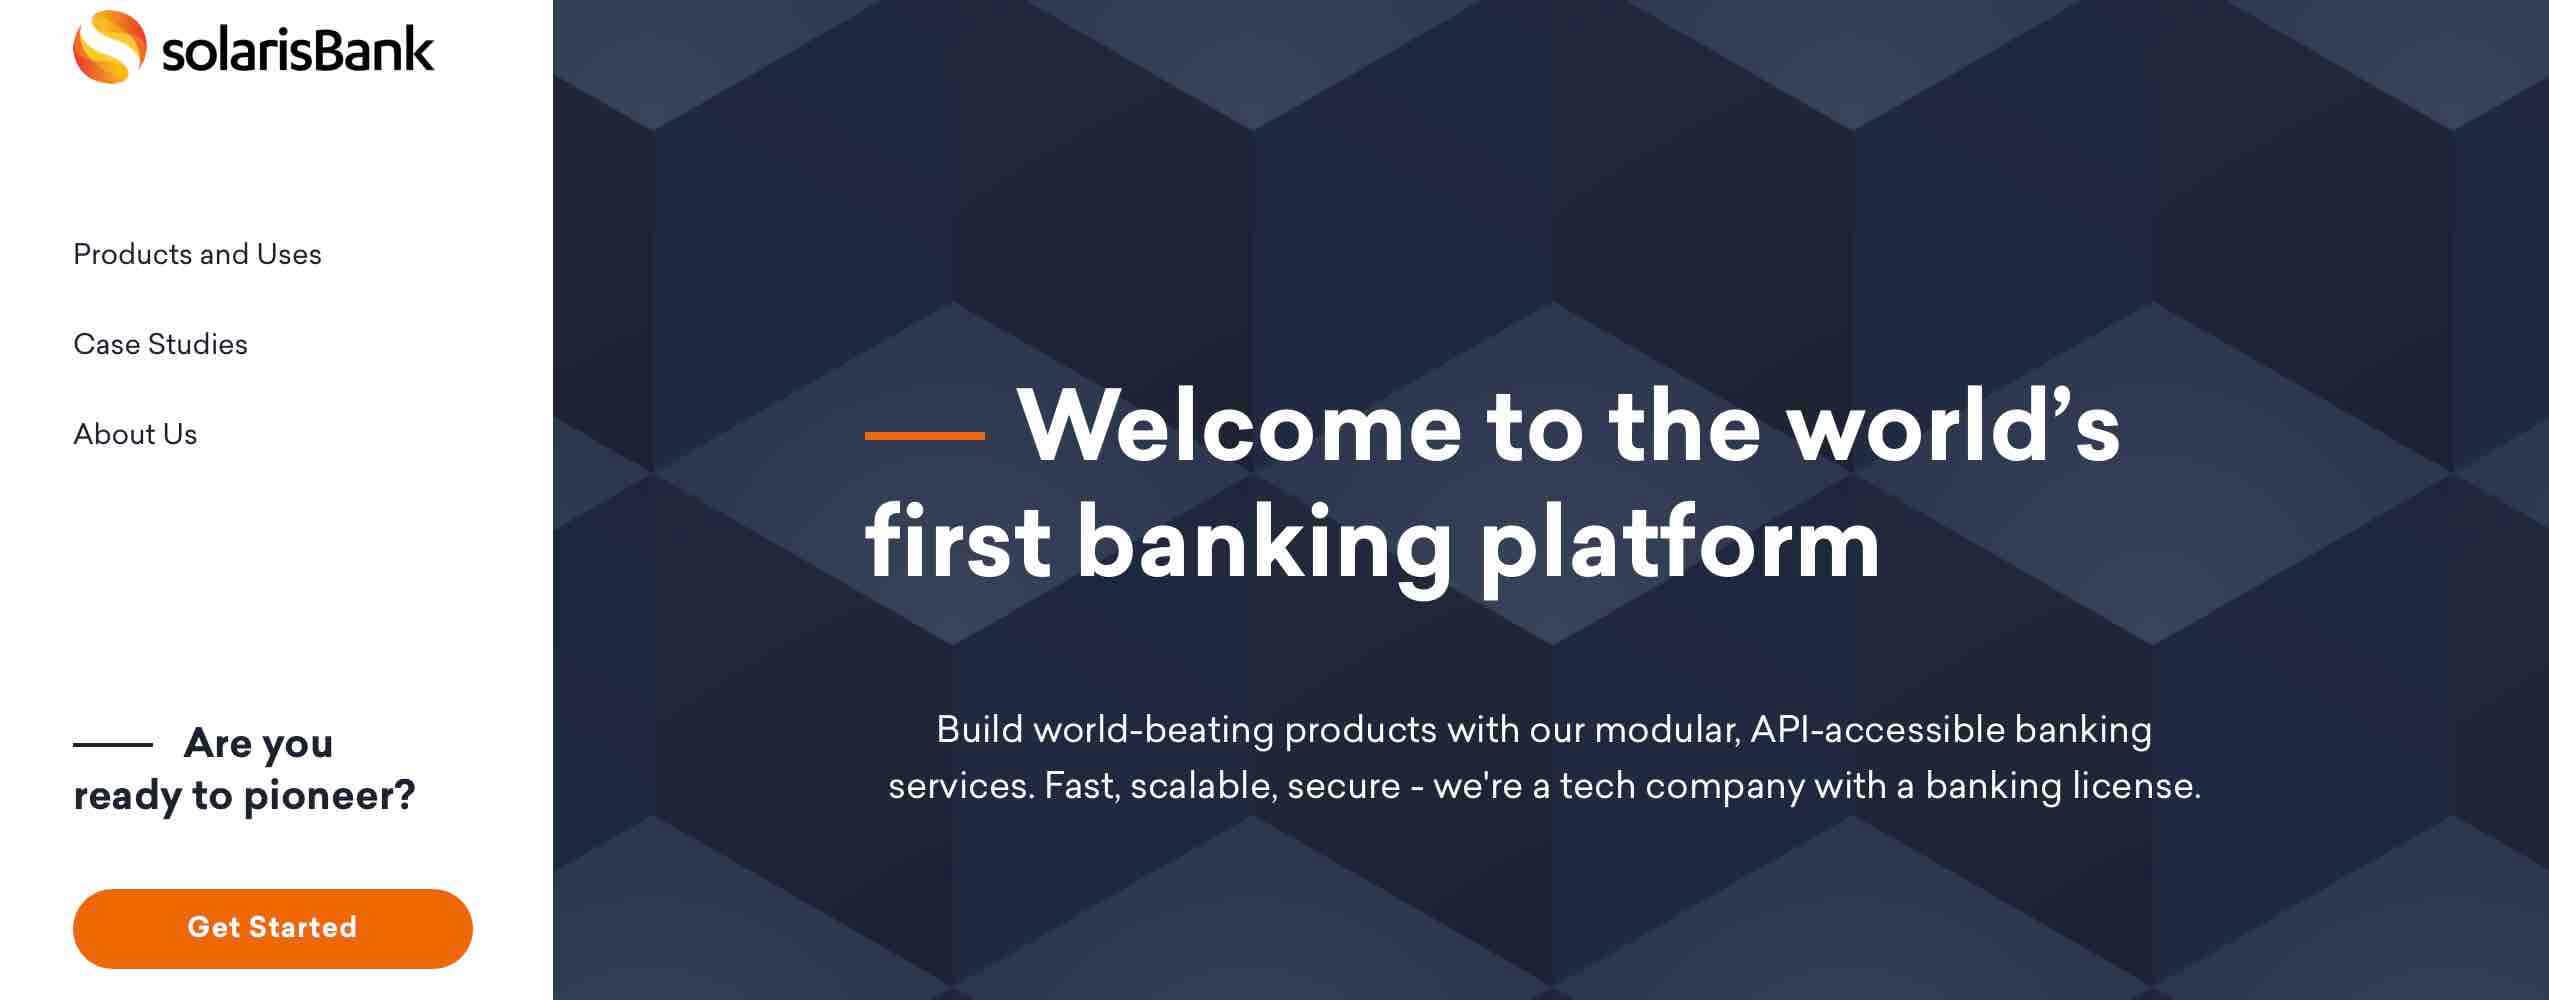 BaaS SolarisBank API fintech